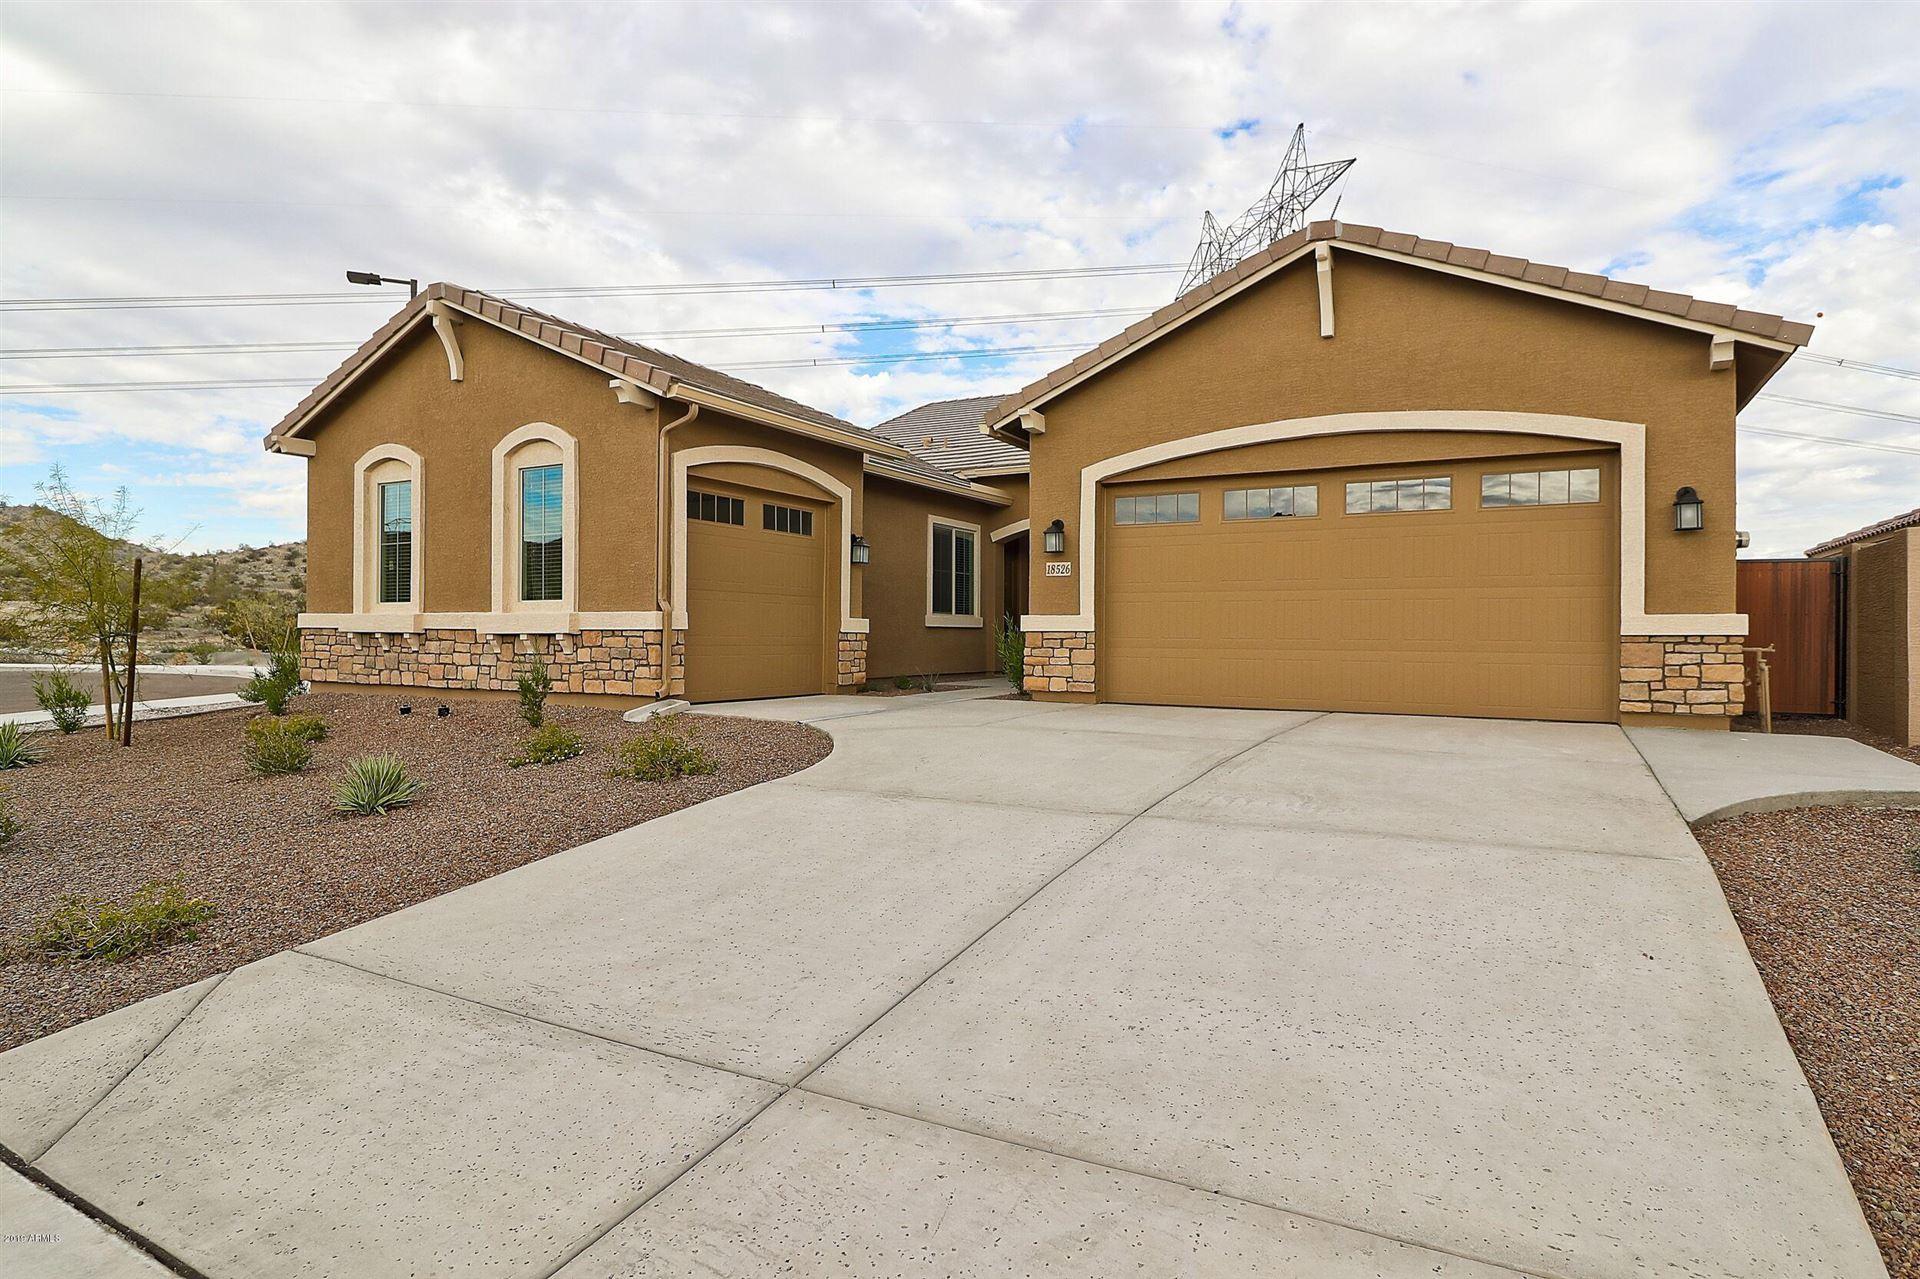 Photo of 18526 W Desert Trumpet Road, Goodyear, AZ 85338 (MLS # 6269034)